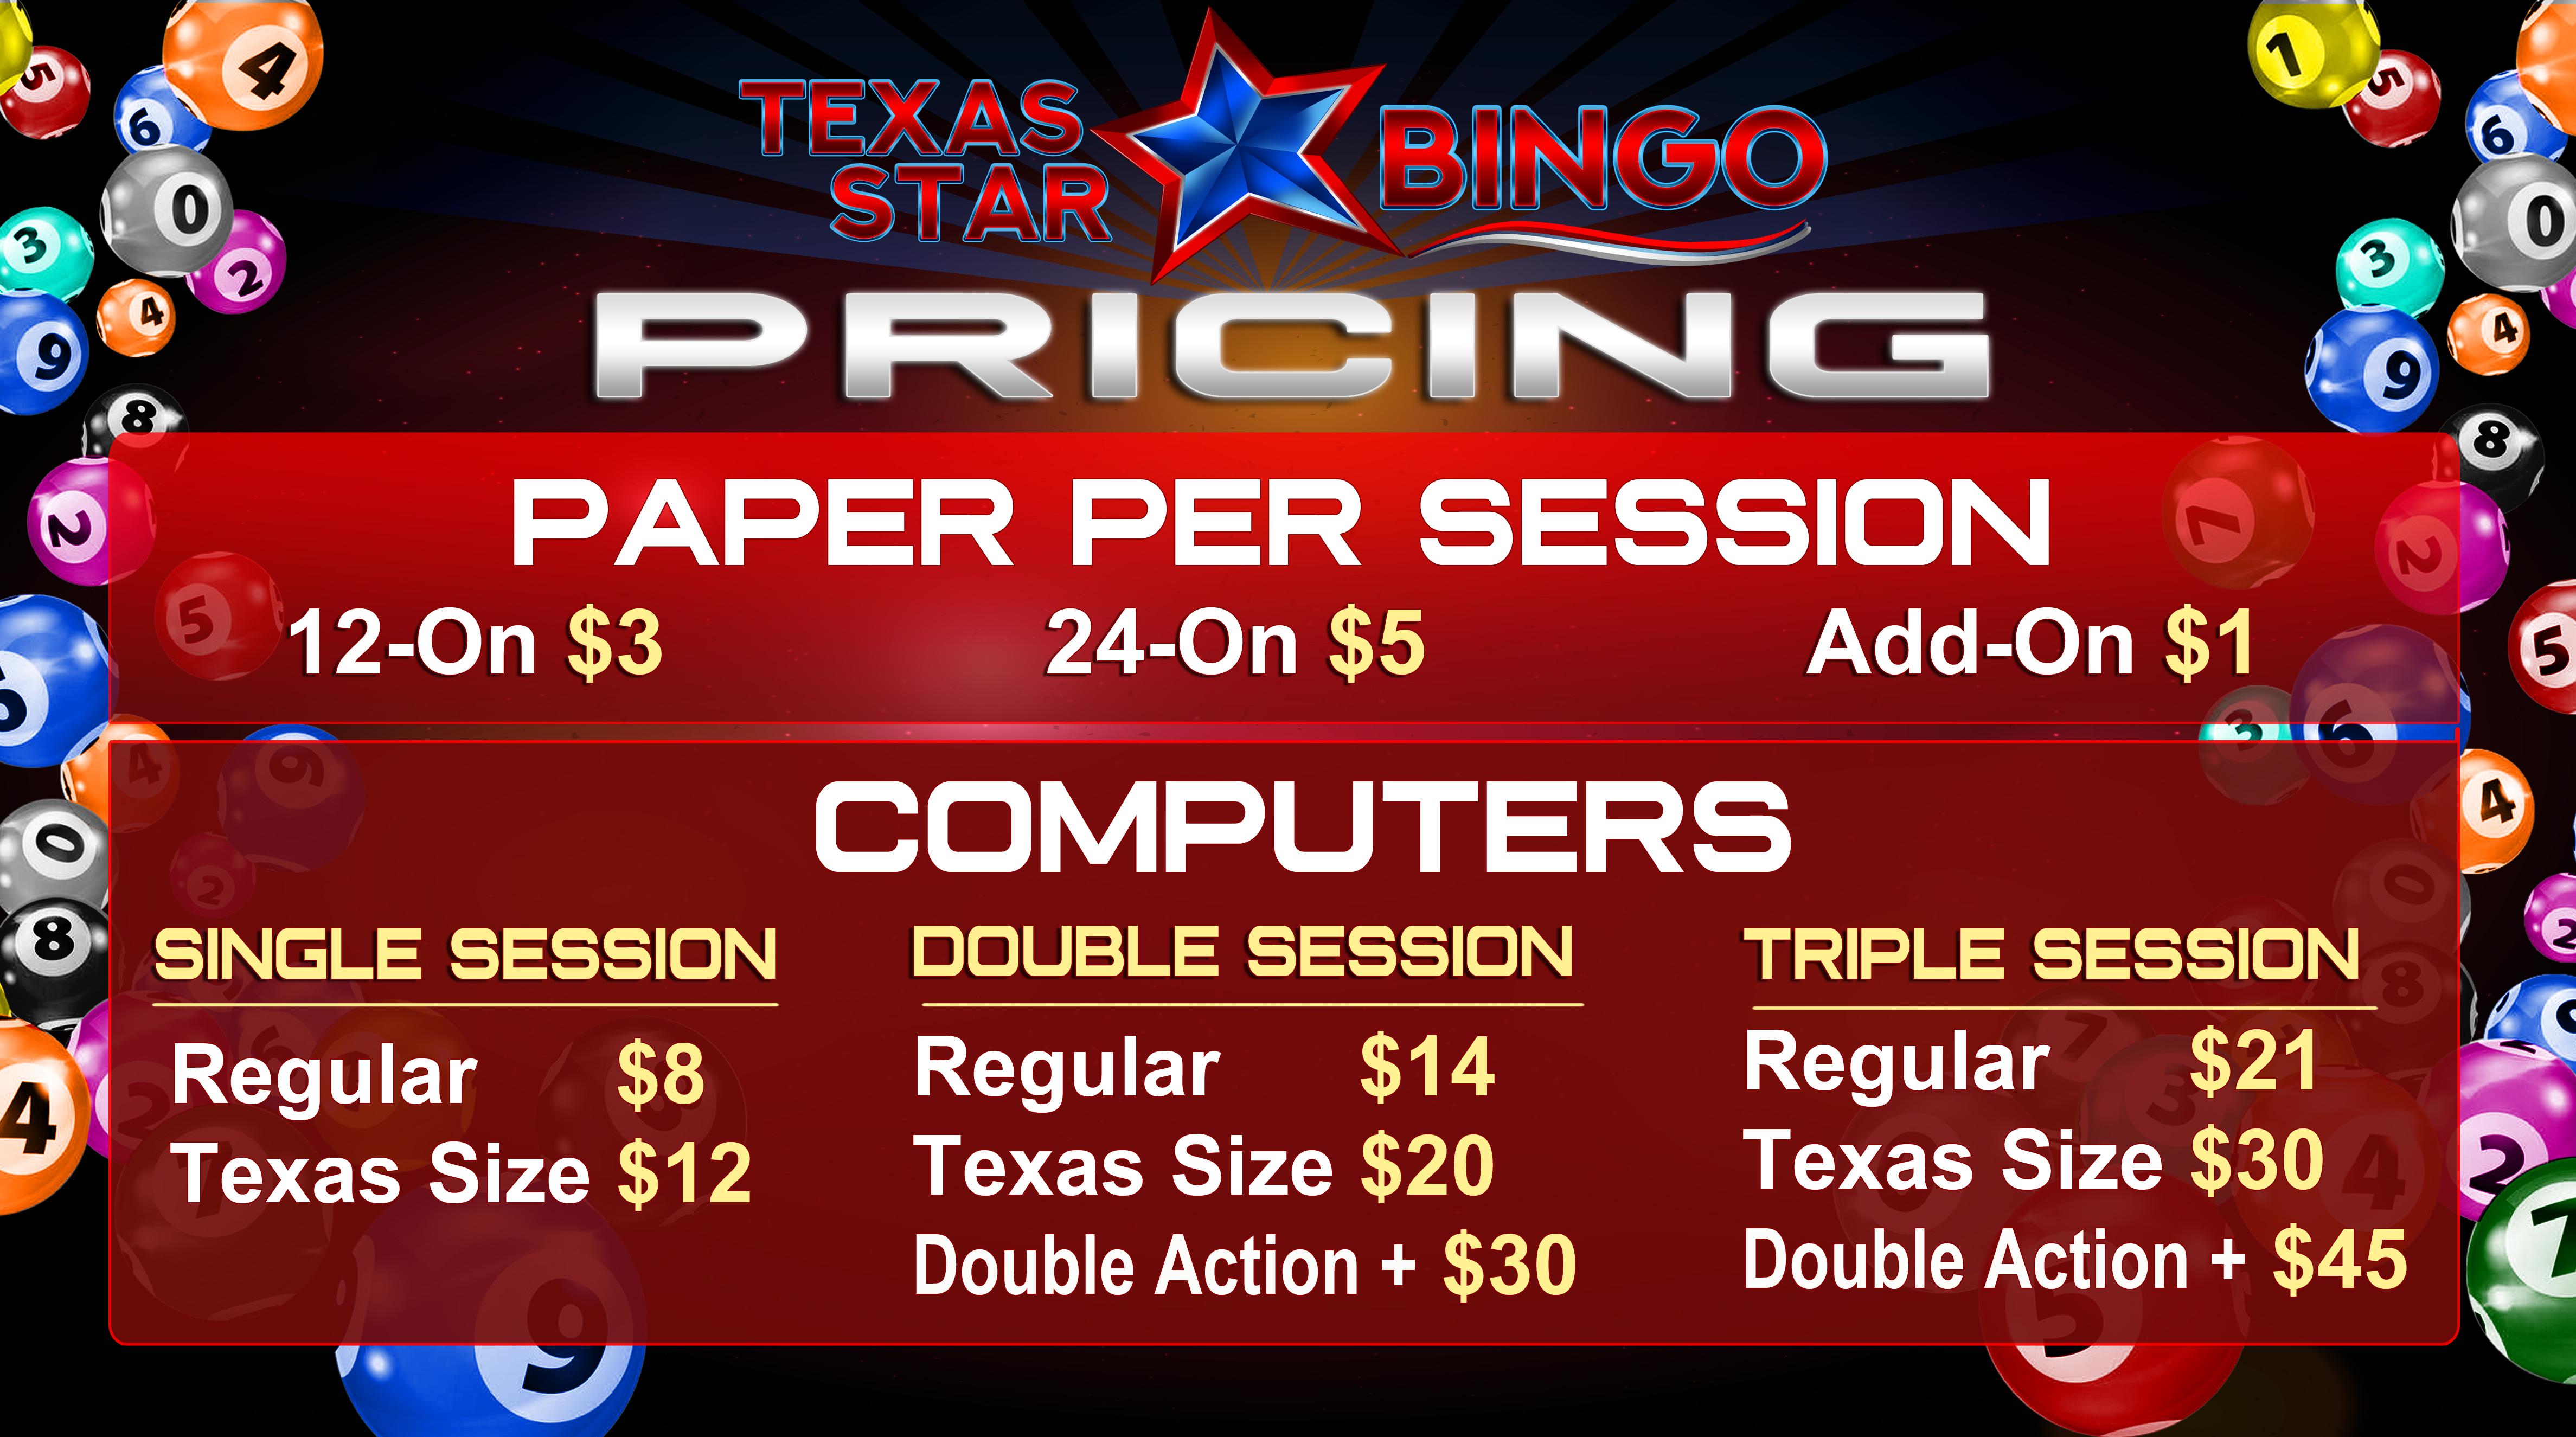 Texas Star Bingo PRICING DA